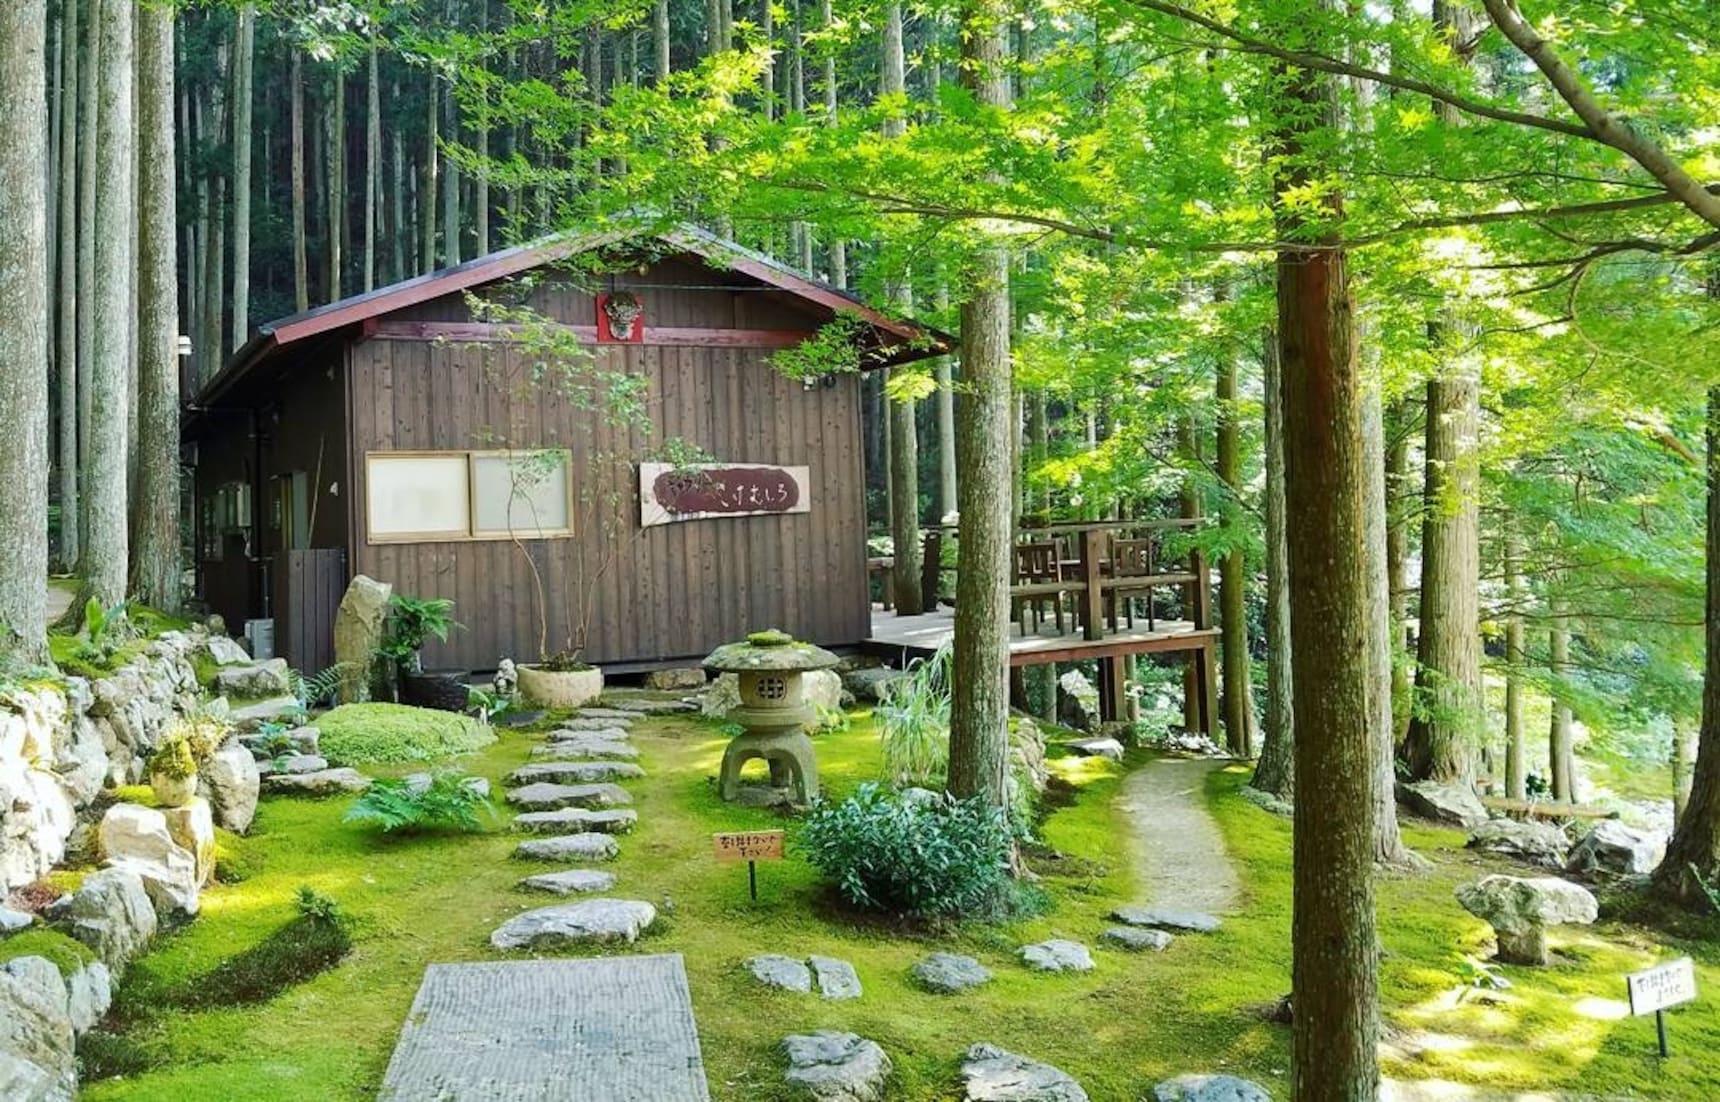 Moss Garden CaféHas Us Enchanted